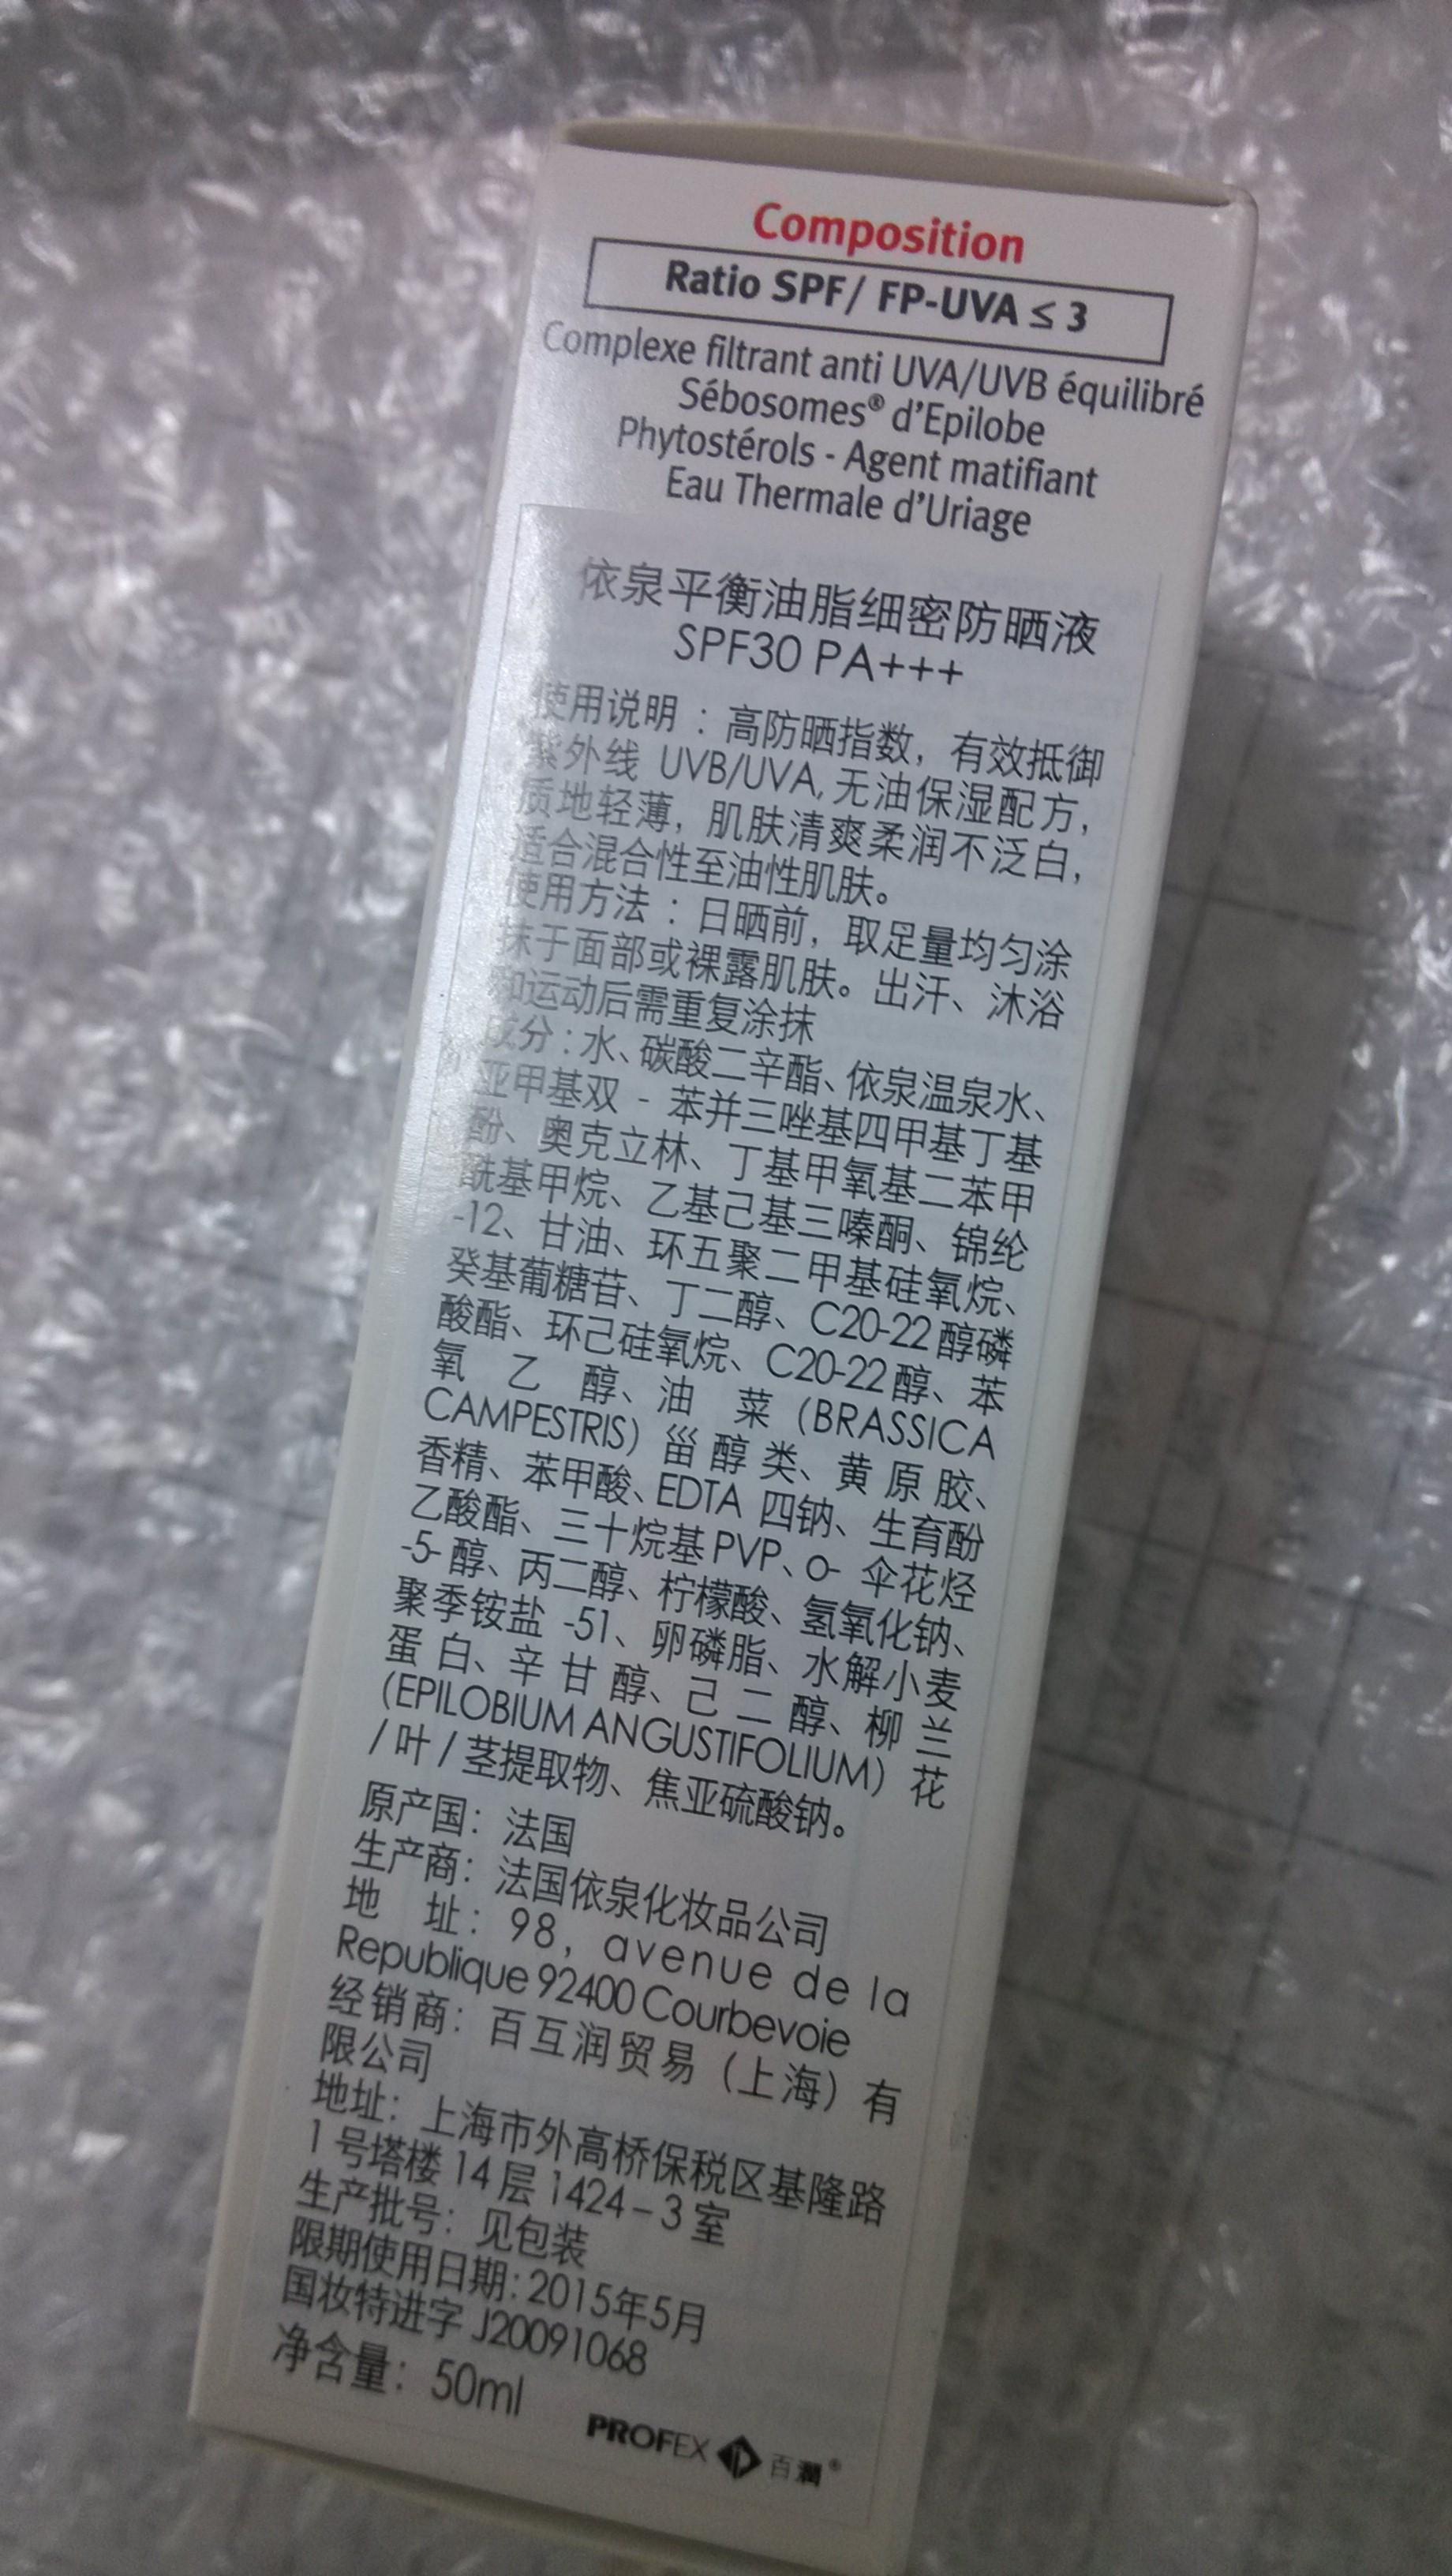 osiris shoes free shipping to canada 00299844 fake